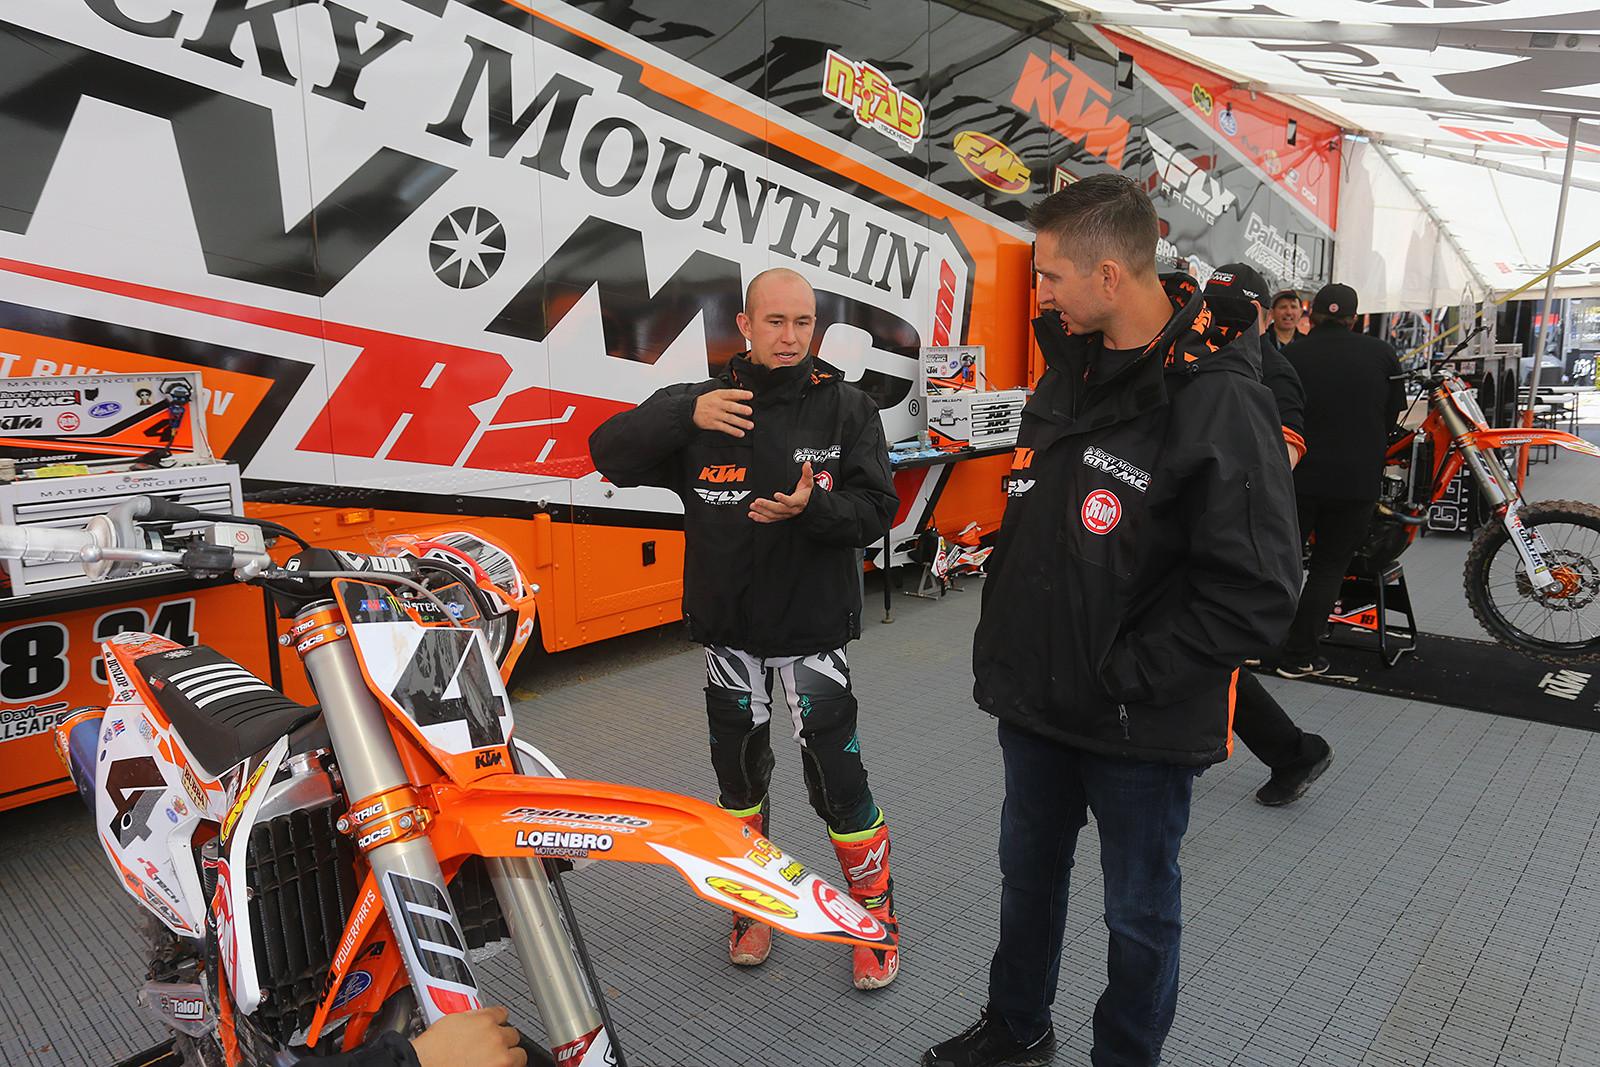 Blake Baggett and Michael Byrne - Vital MX Pit Bits: Salt Lake City - Motocross Pictures - Vital MX